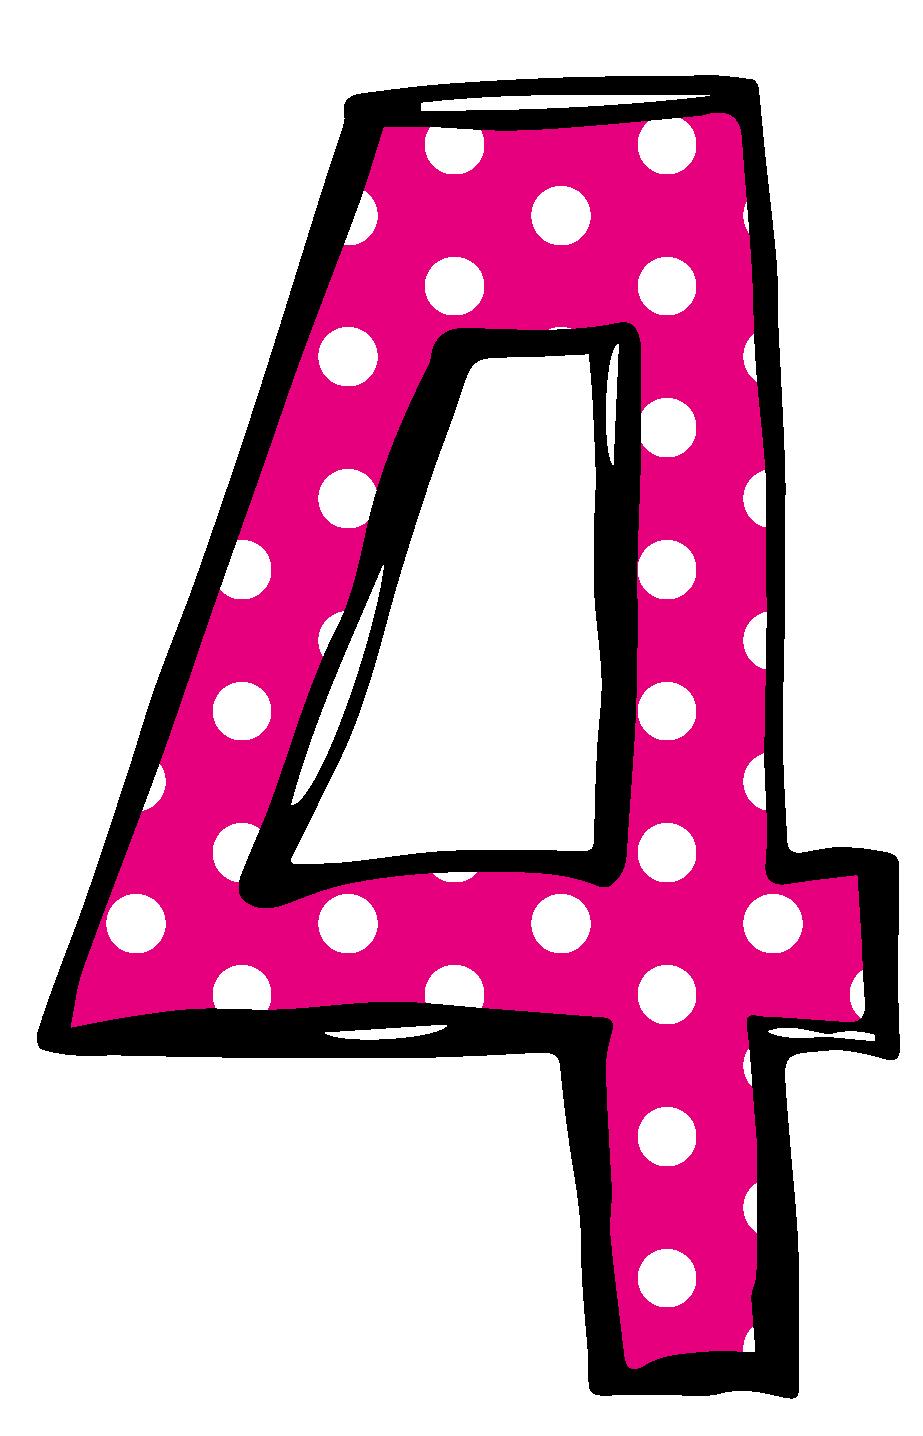 923x1436 Polka Dot Number 3 Clipart